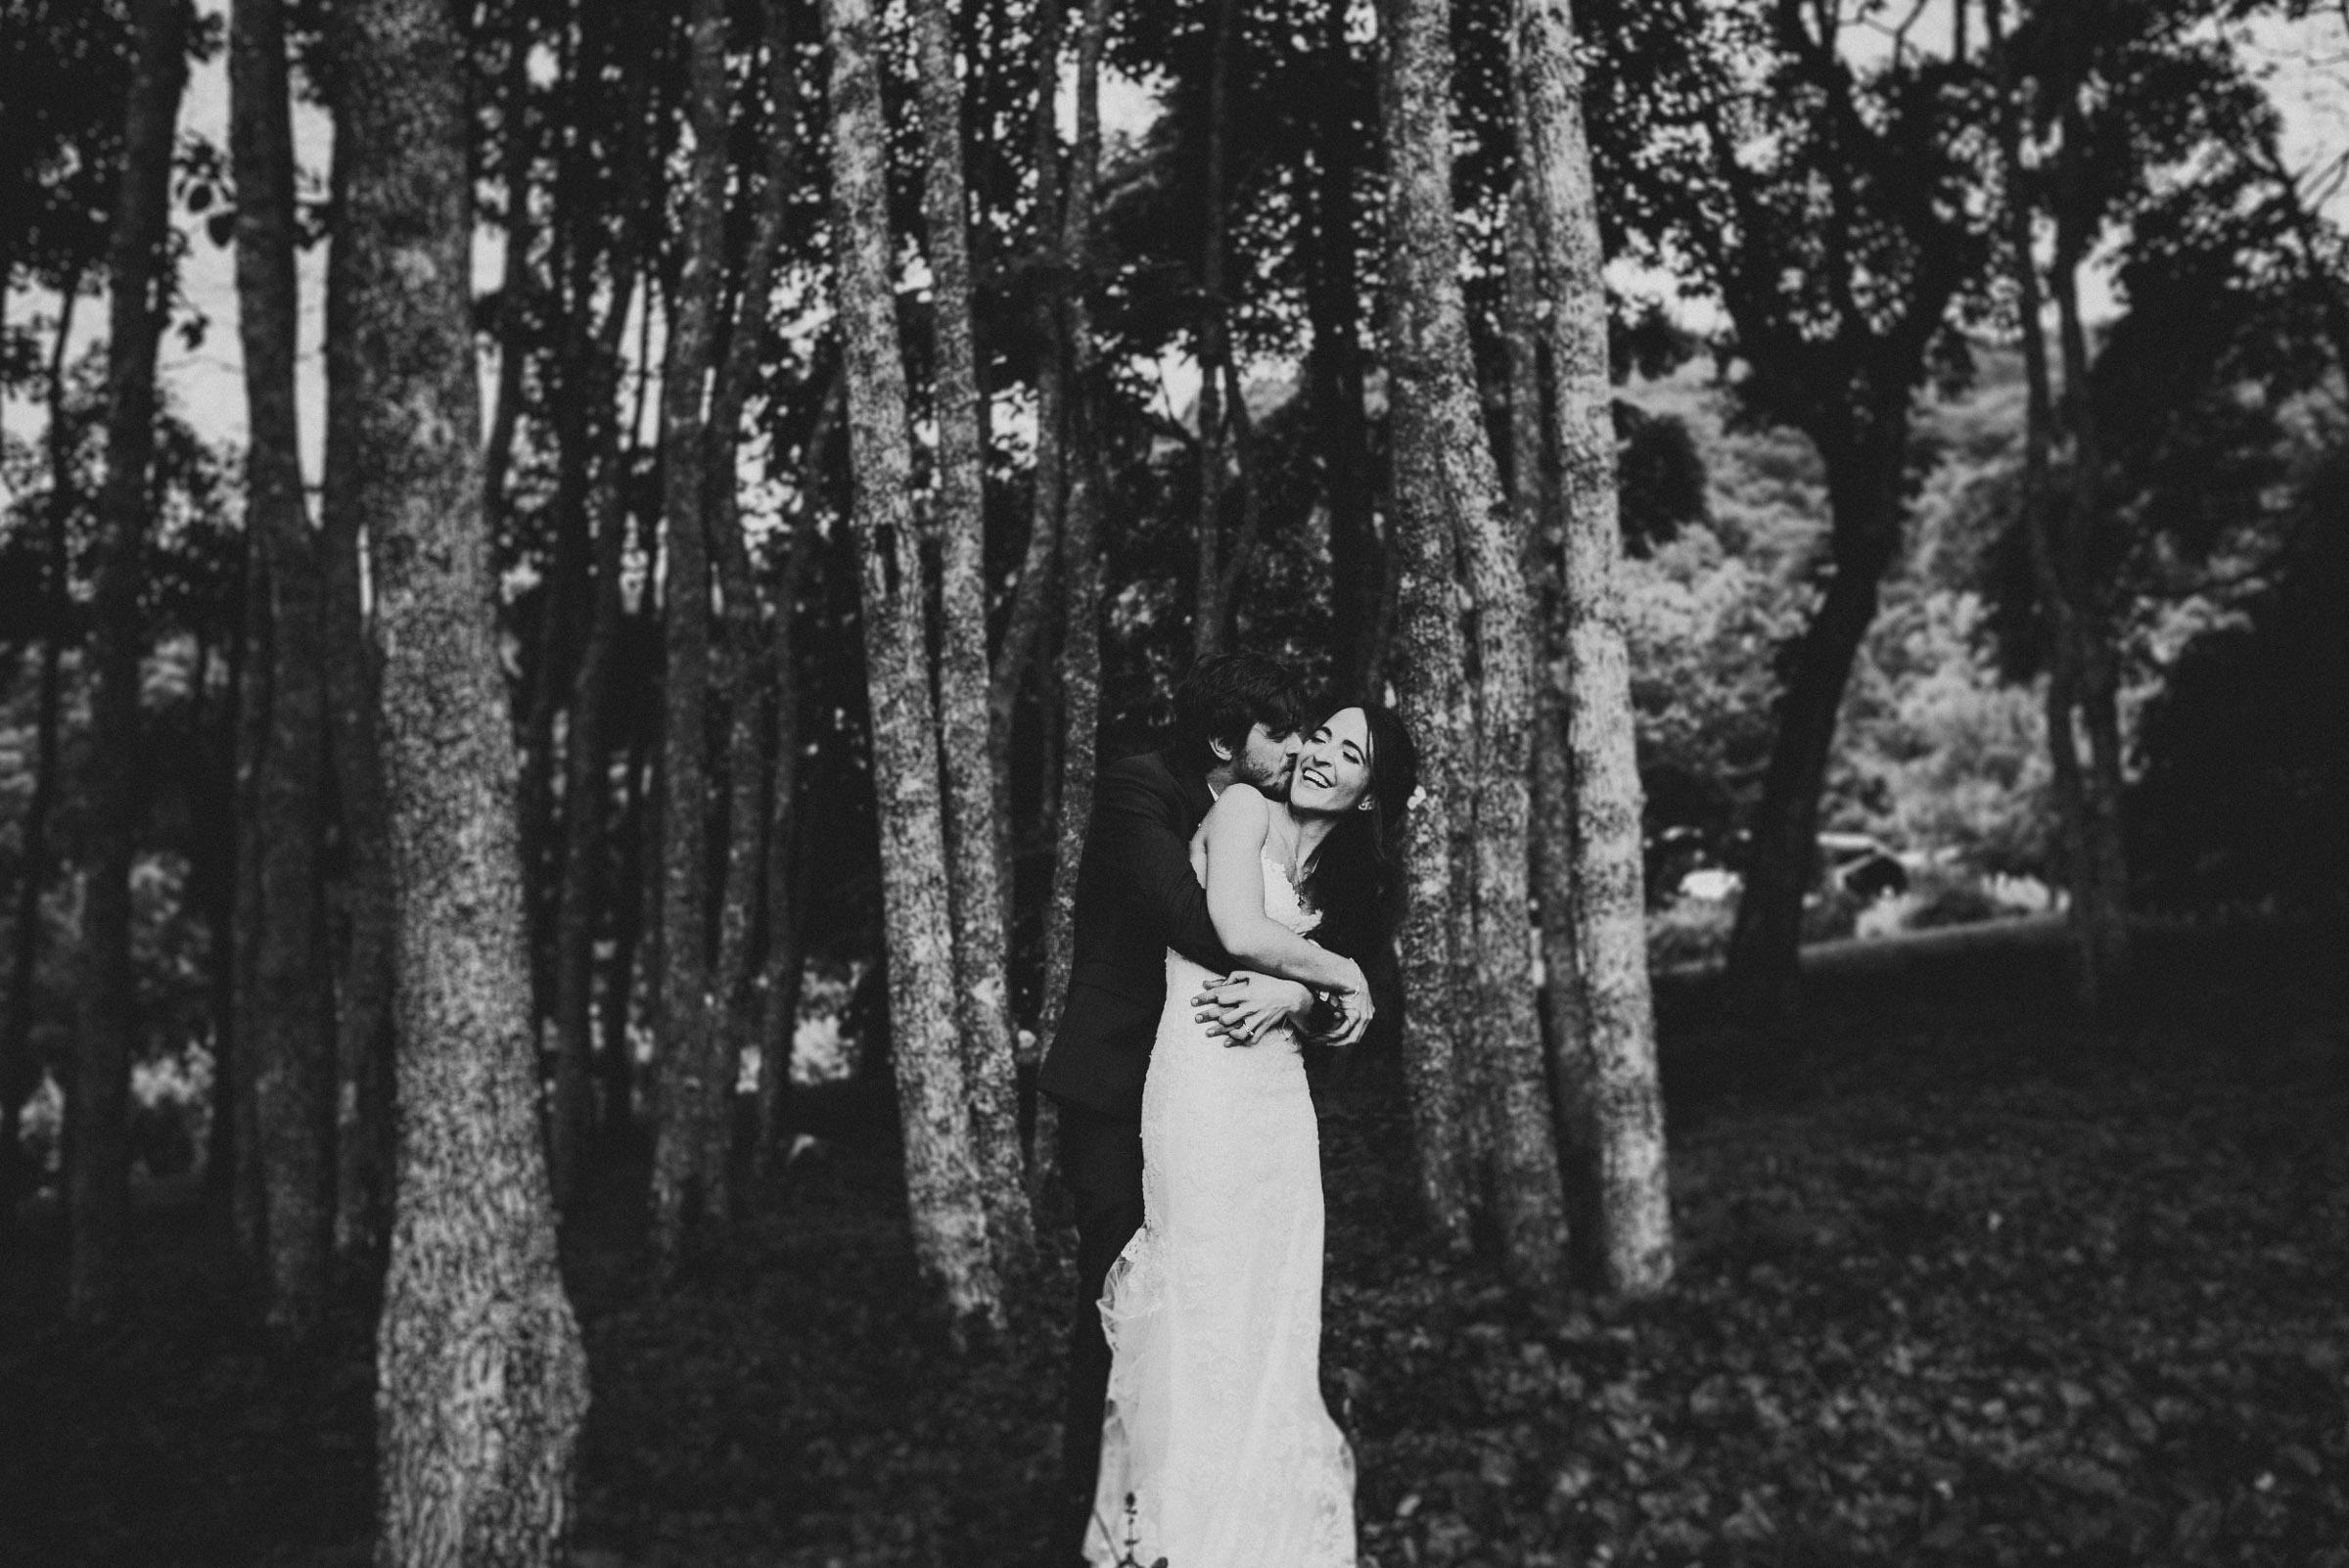 asheville wedding photographer at vineyards at bettys creek